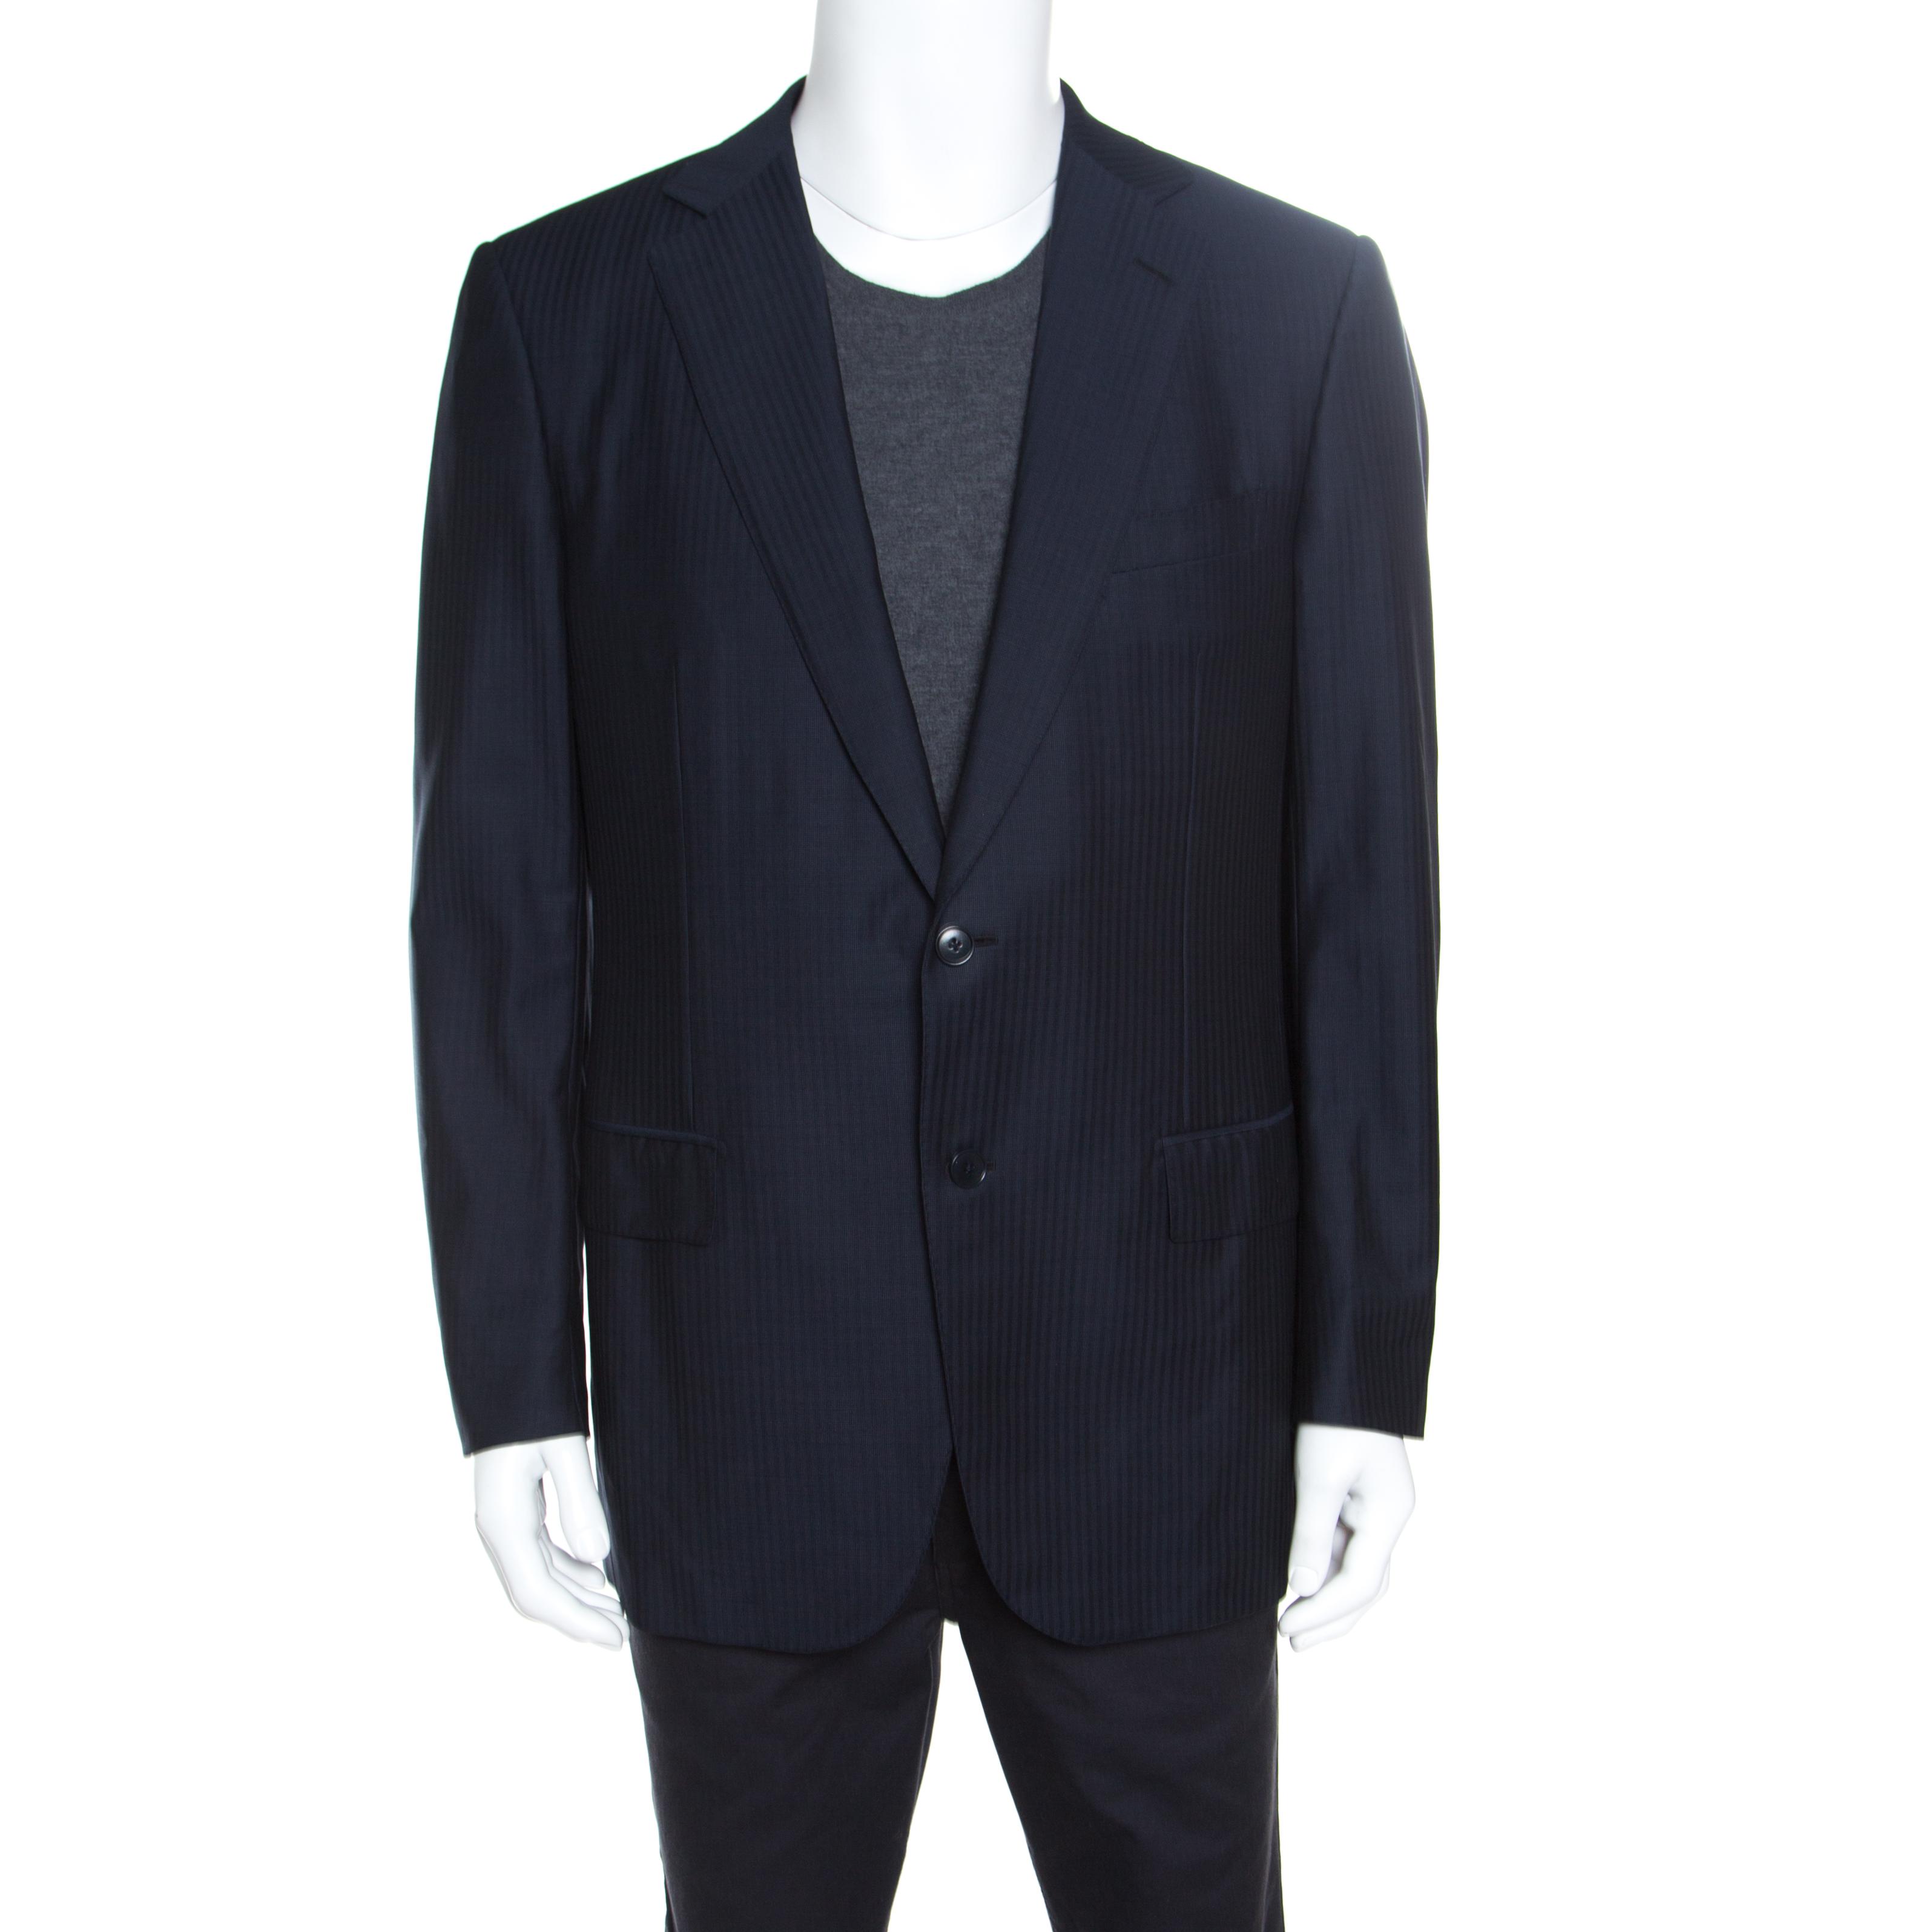 197550be5f Ermenegildo Zegna Navy Blue Tonal Striped Wool Blazer XL